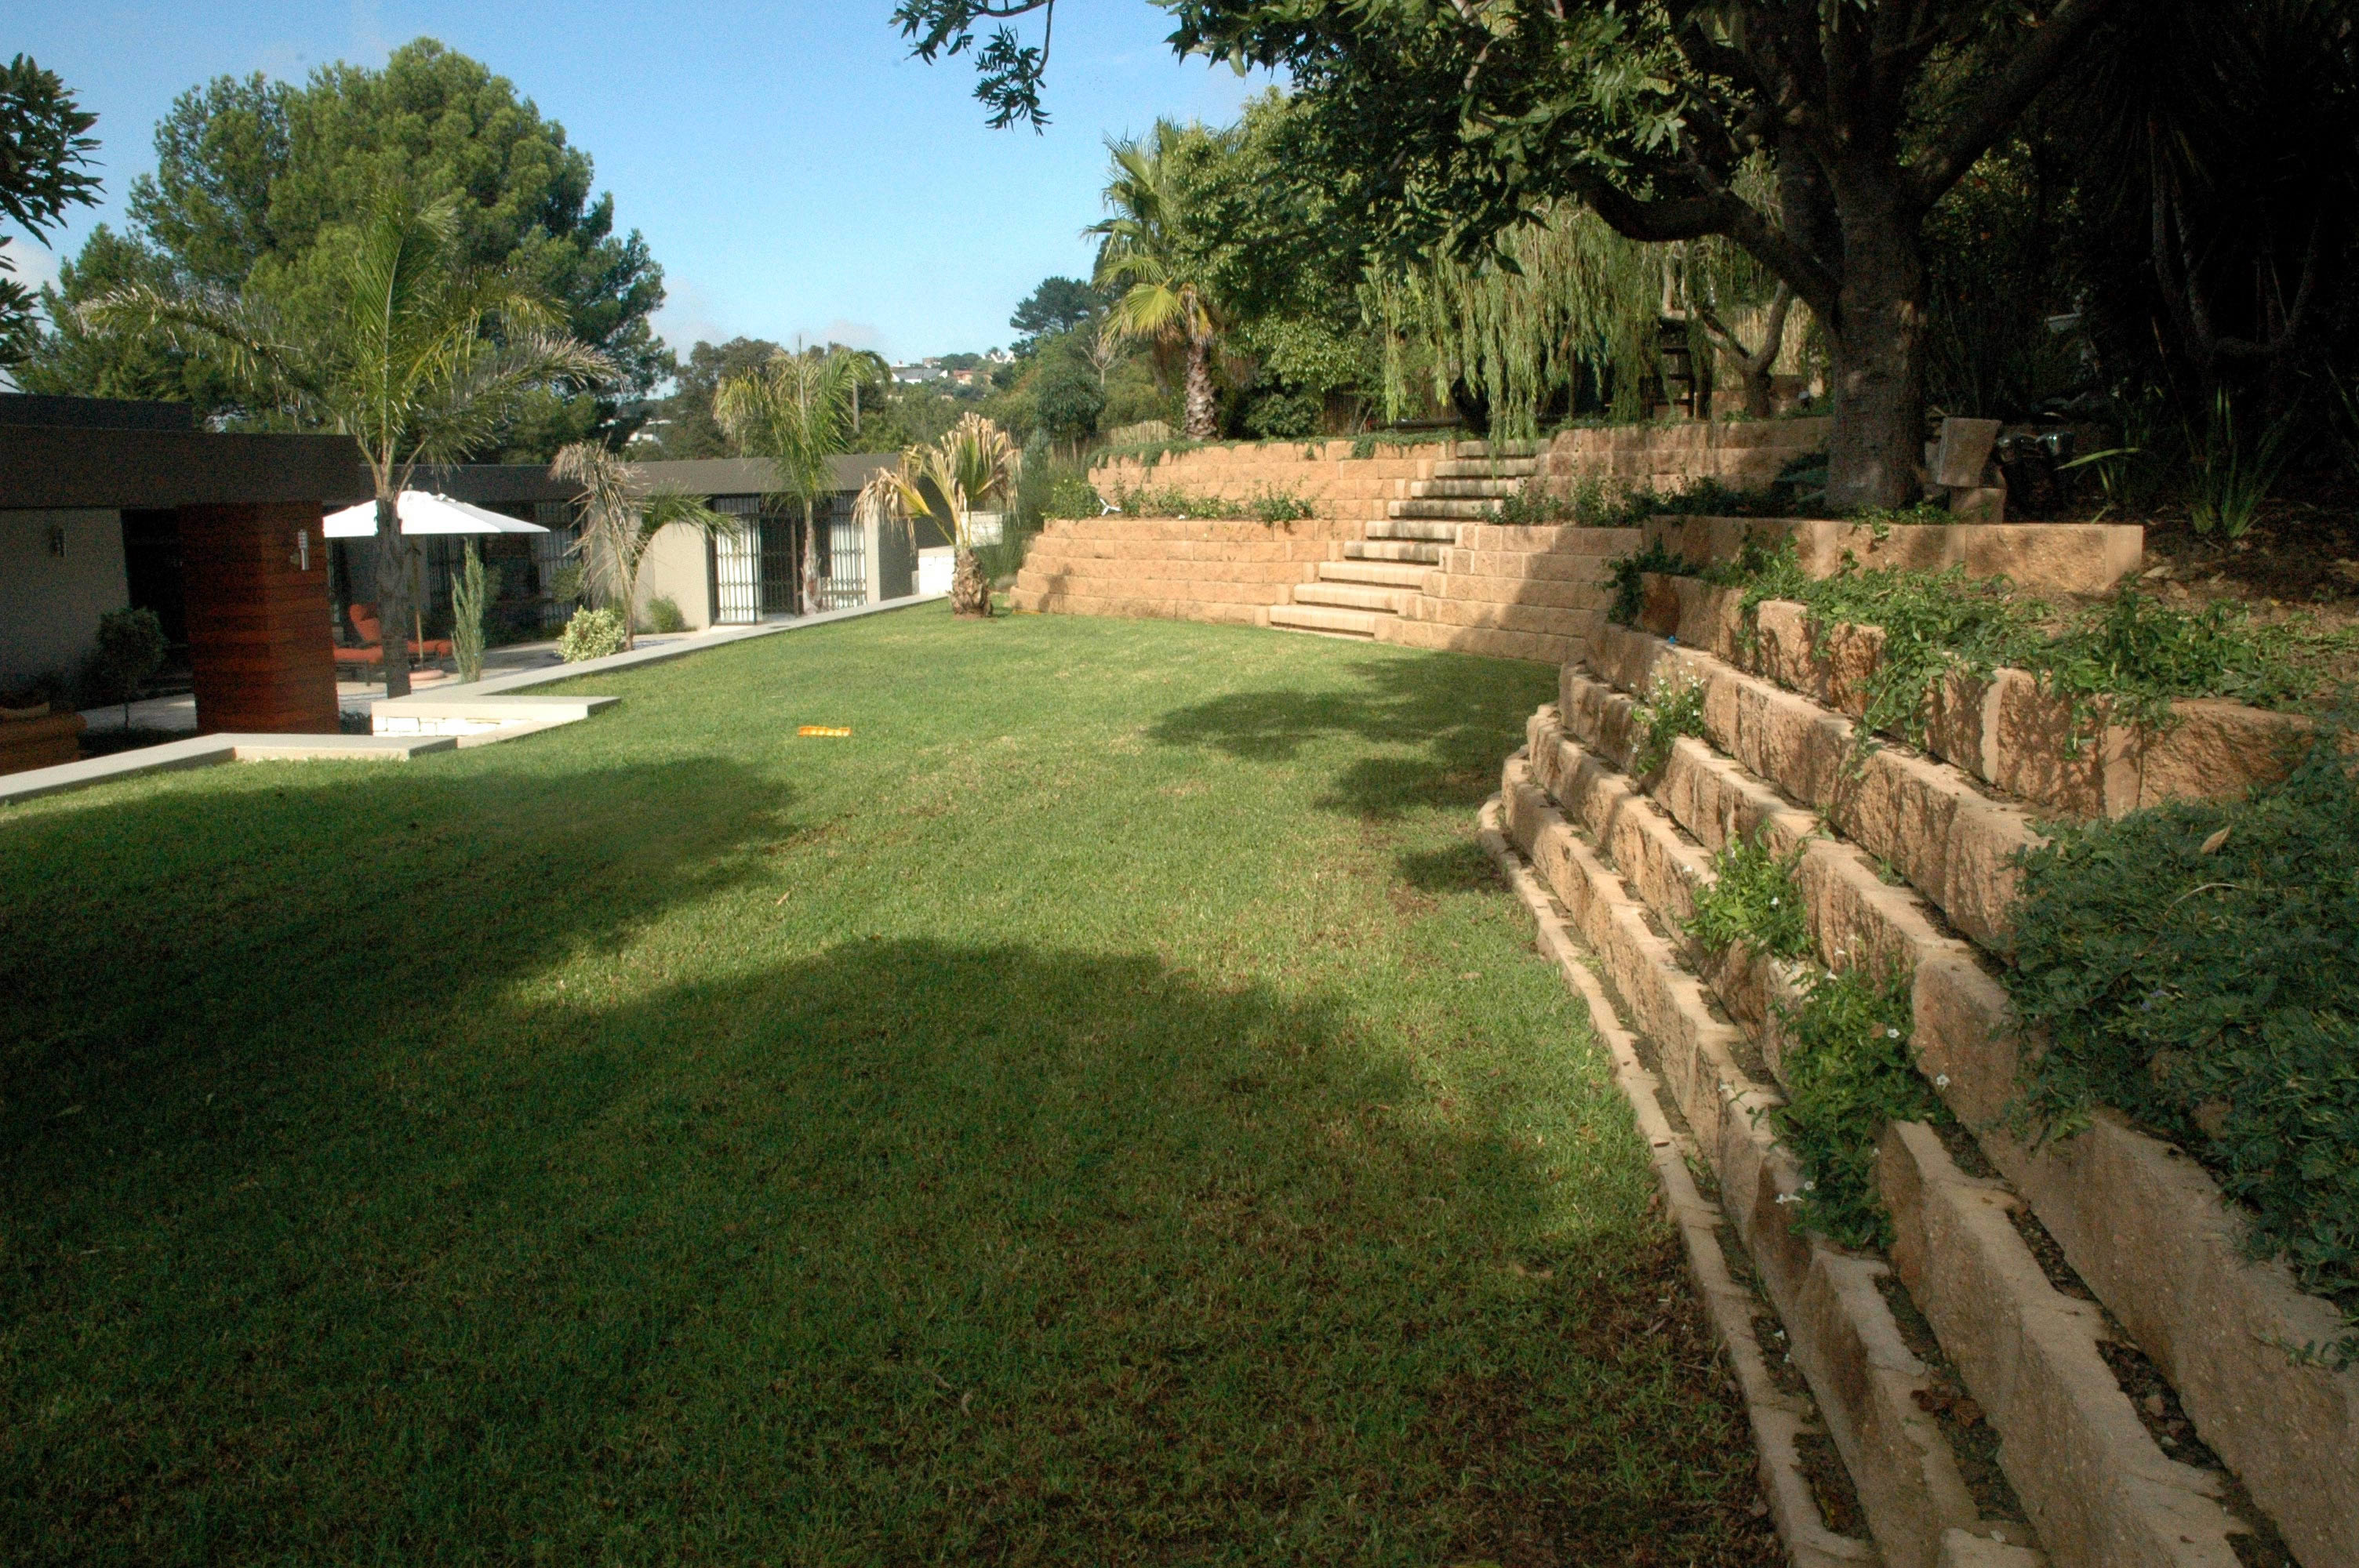 Landscape Blocks On A Slope : Steep slope transformed into a spacious garden terraforce